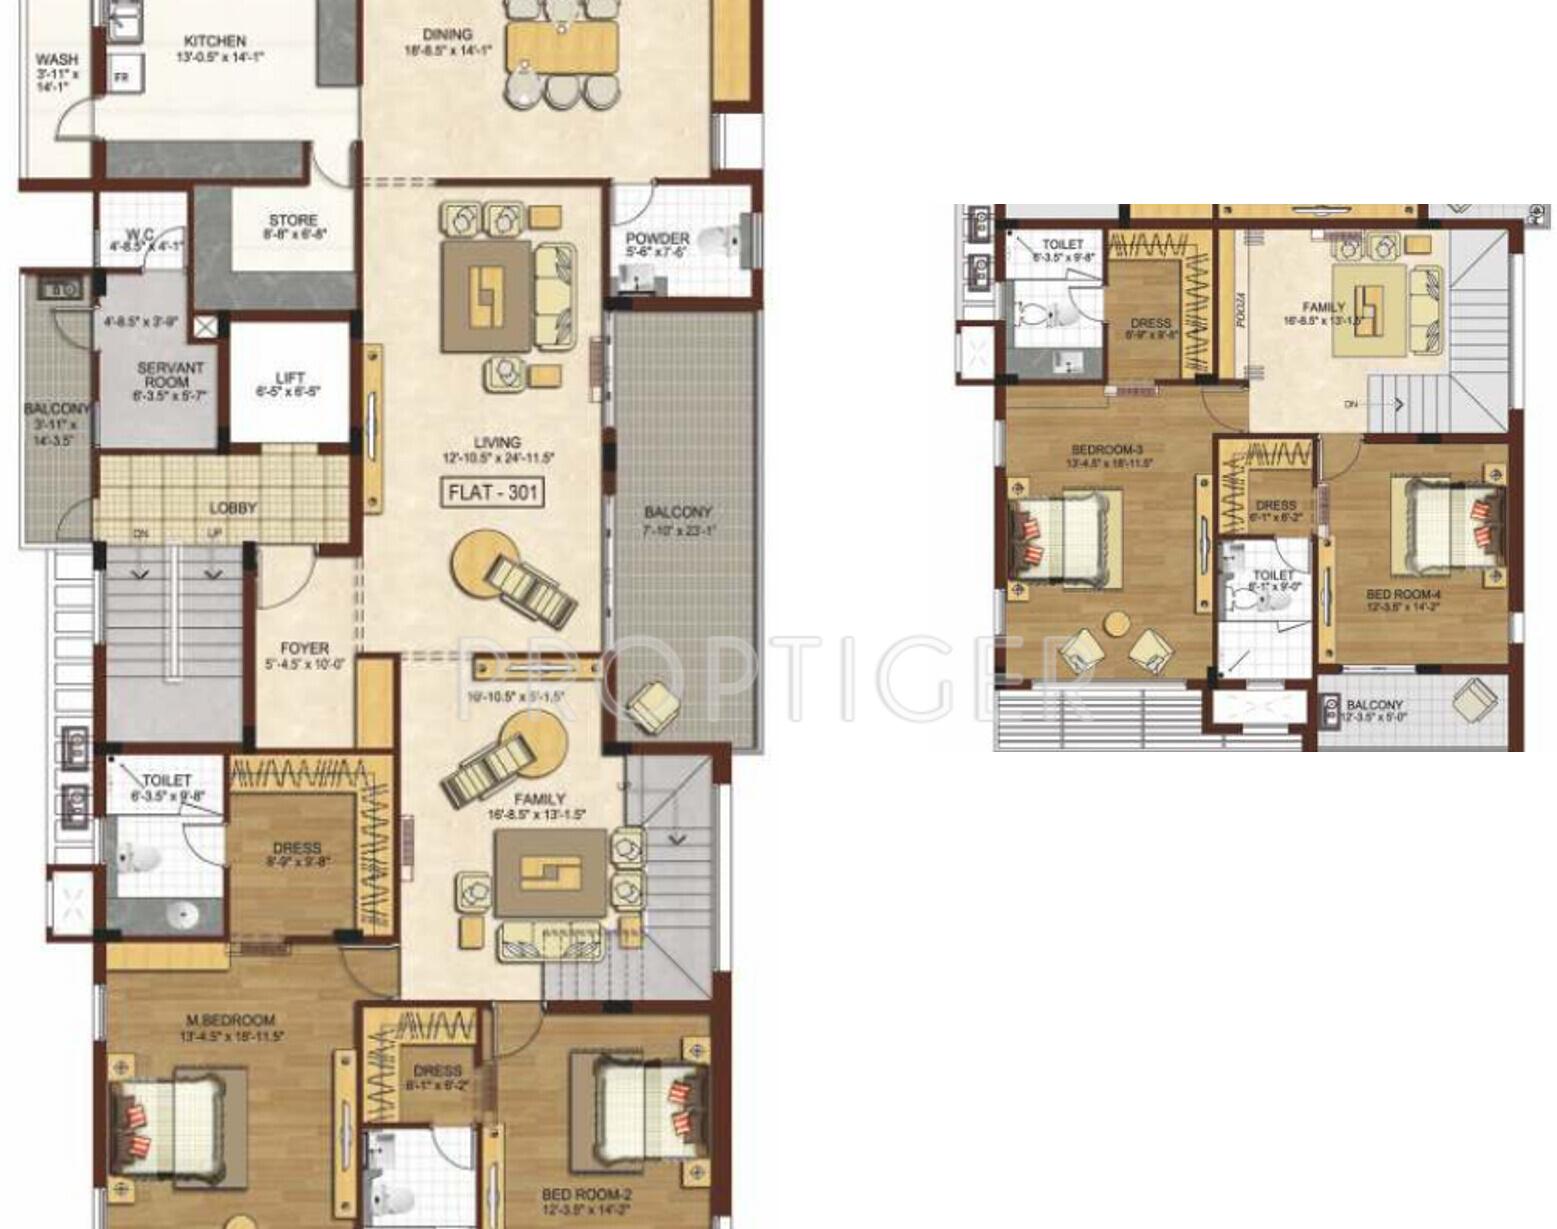 100 350 Sq Feet 100 400 Sq Ft The Ohana House A 400